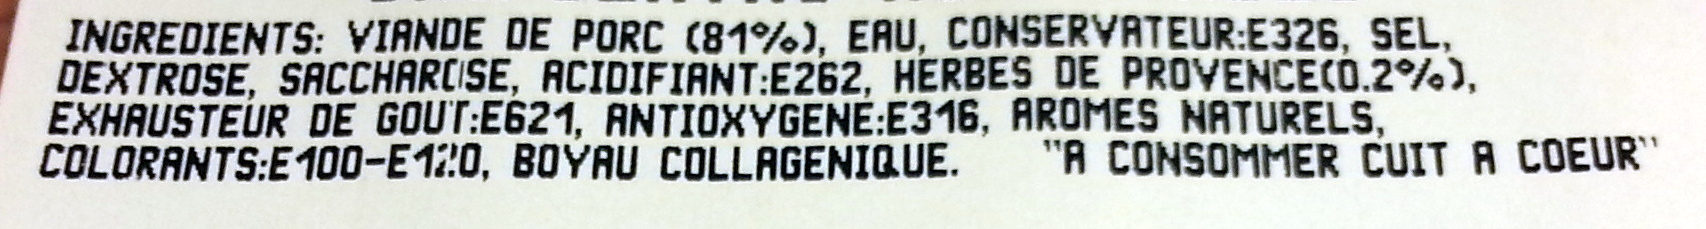 Chipolatas aux Herbes - Ingredients - fr